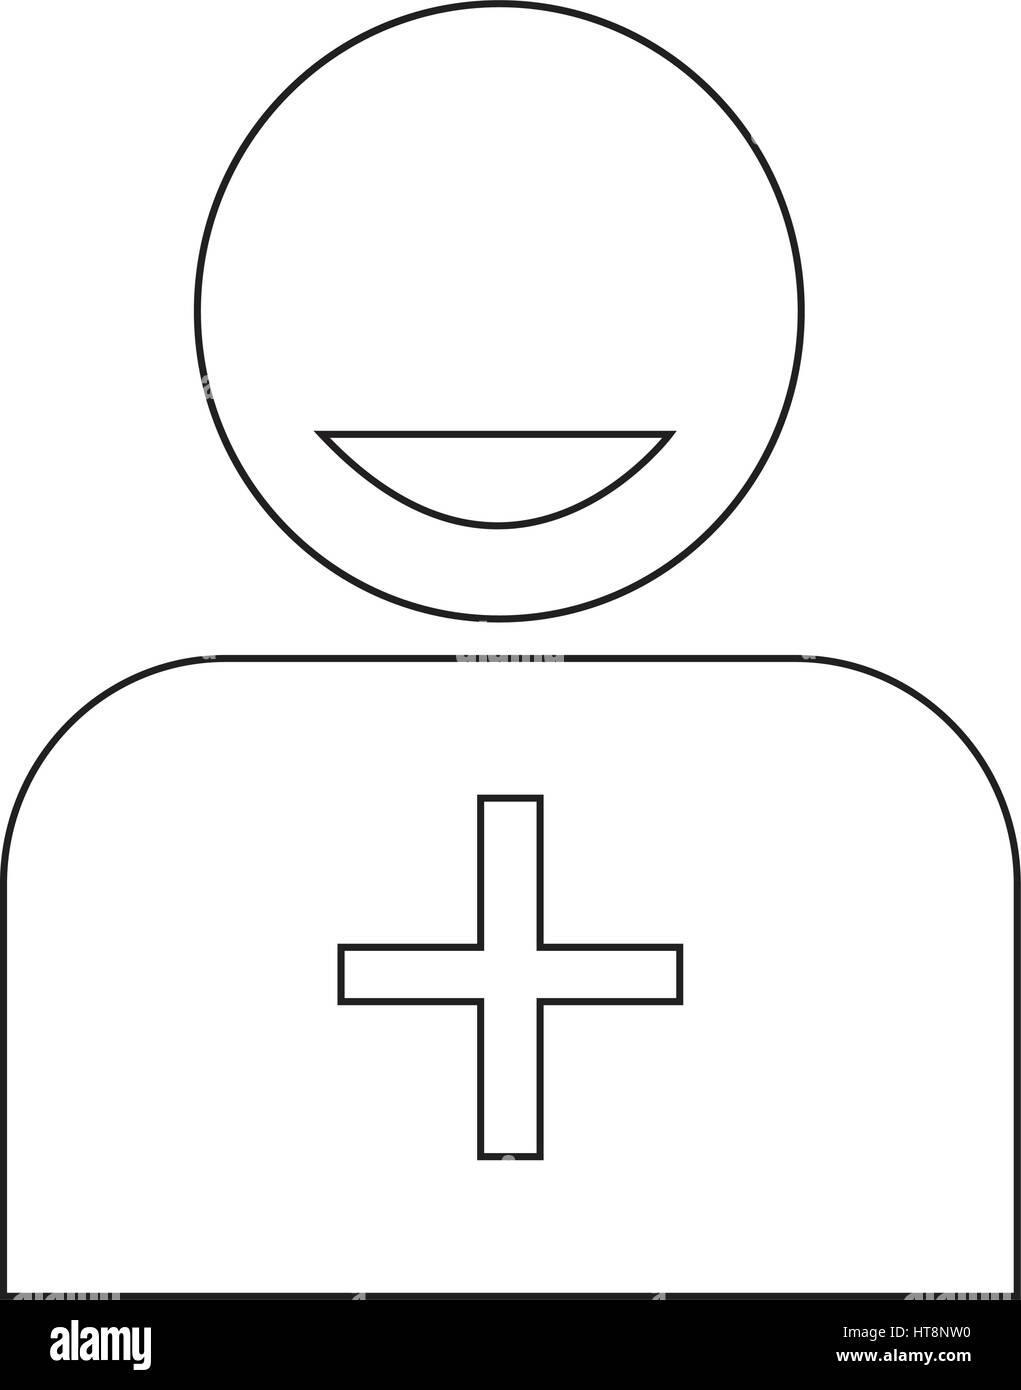 Add friend icon illustration idesign - Stock Image